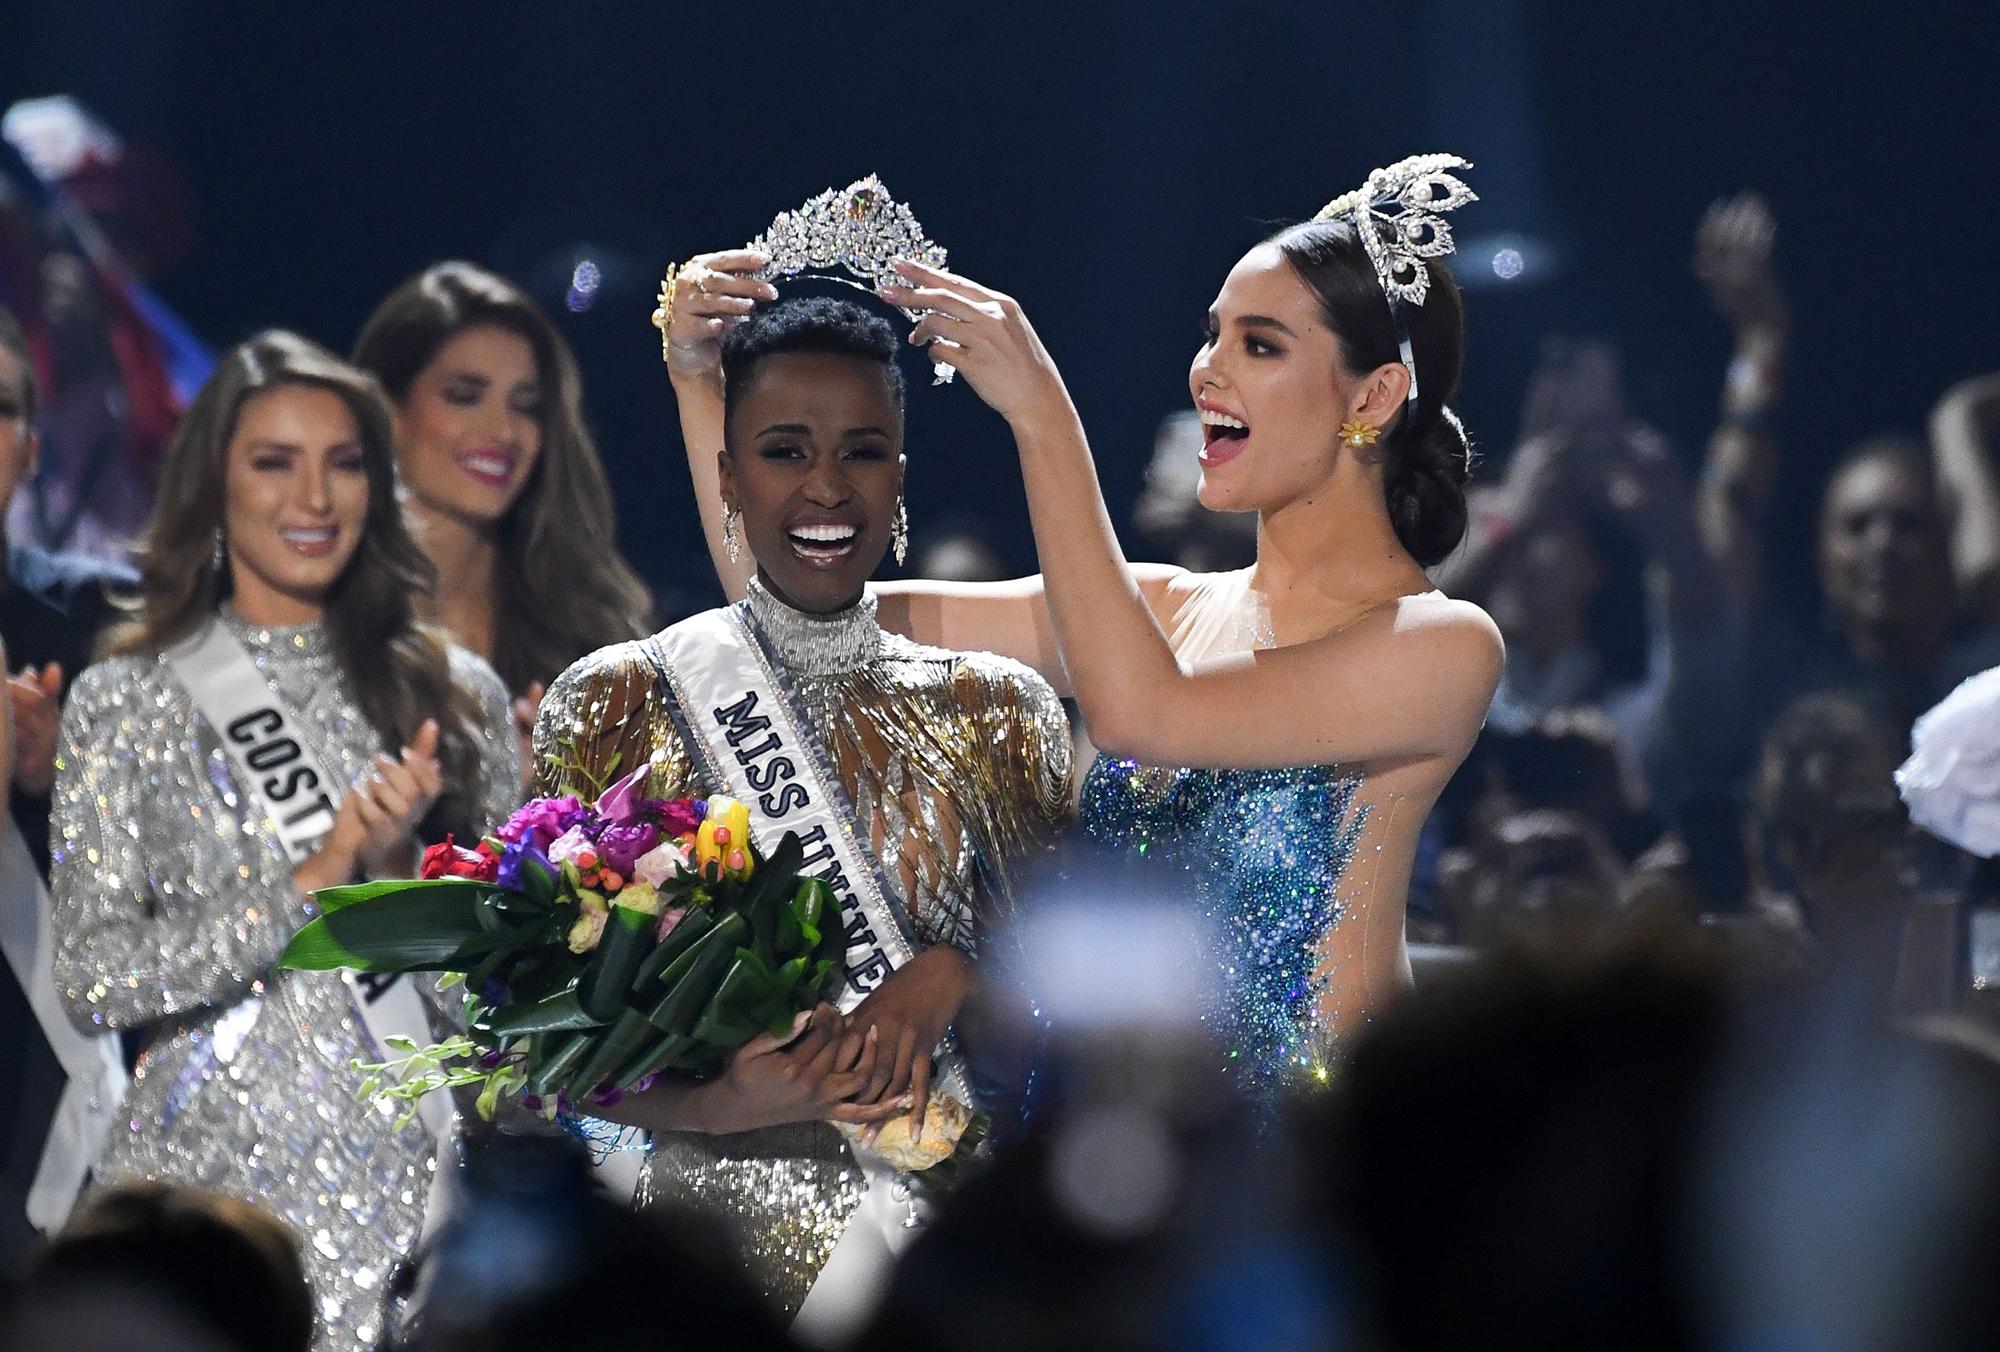 South Africa's Zozibini Tunzi is Crowned Miss Universe 2019 | KTLA